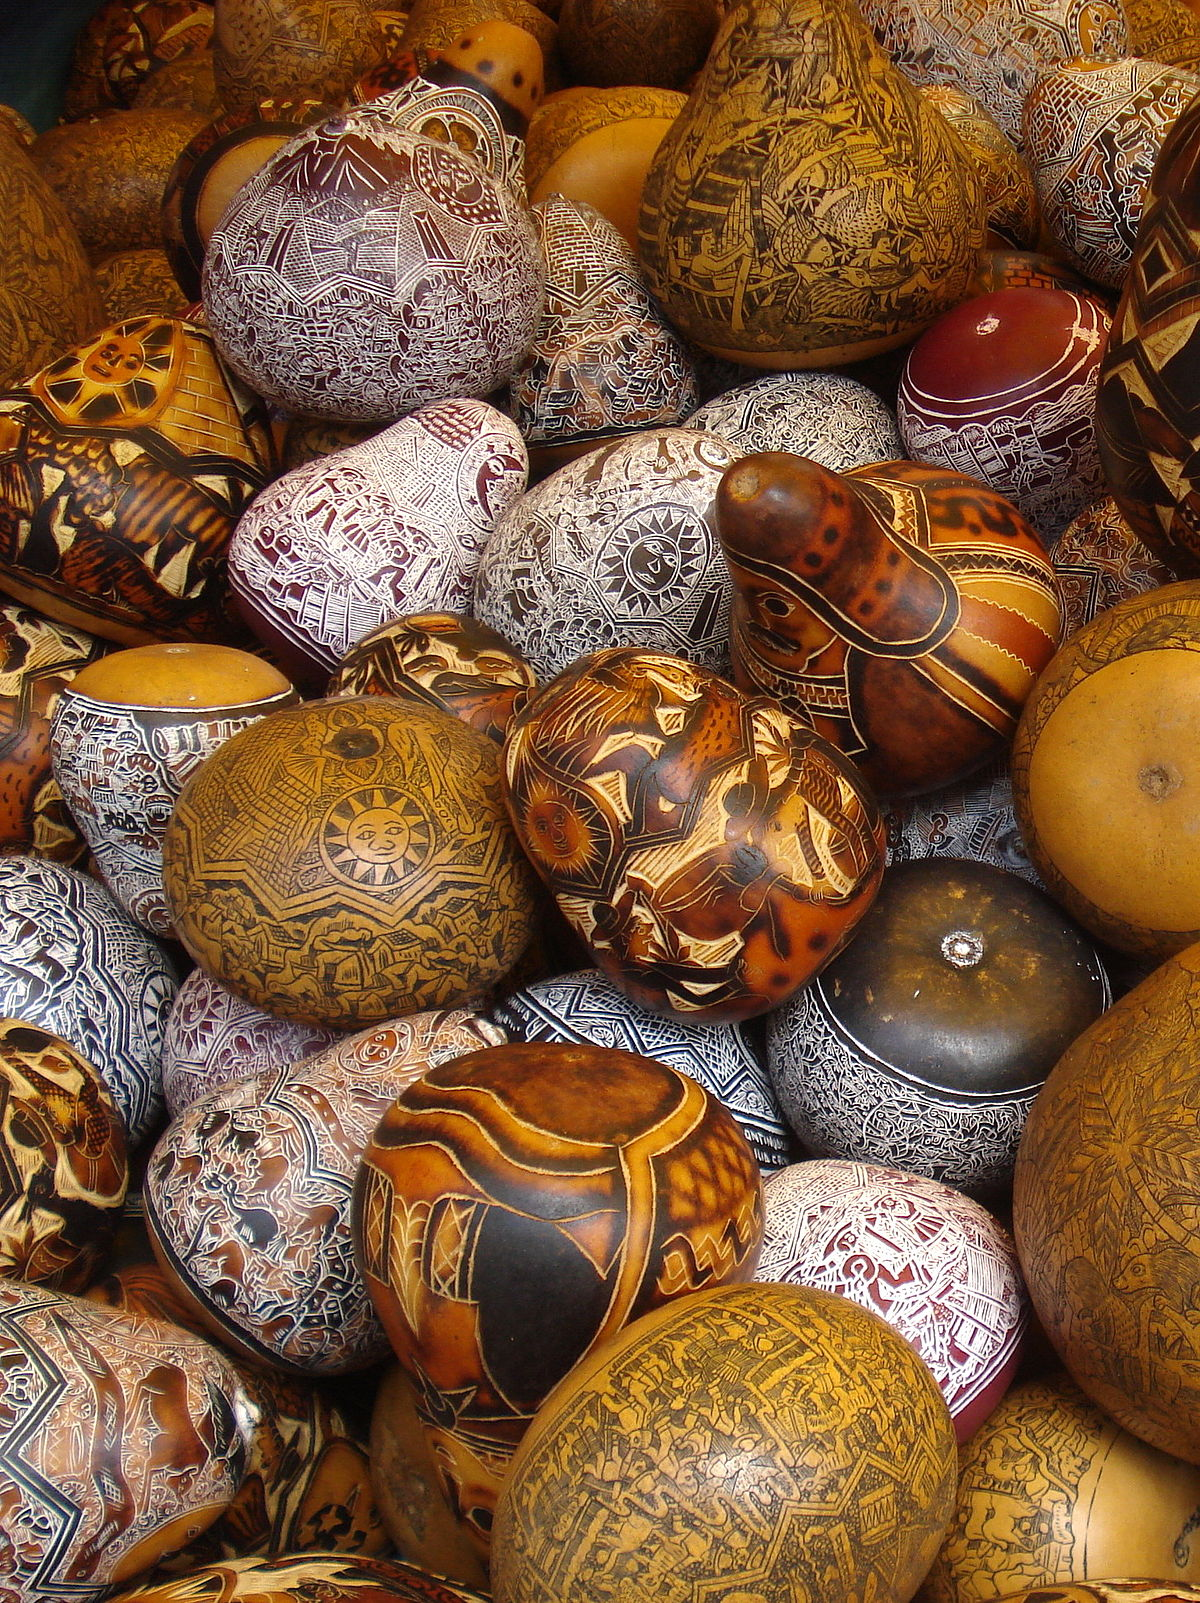 Mate burilado wikipedia la enciclopedia libre for Ceramica artesanal peru